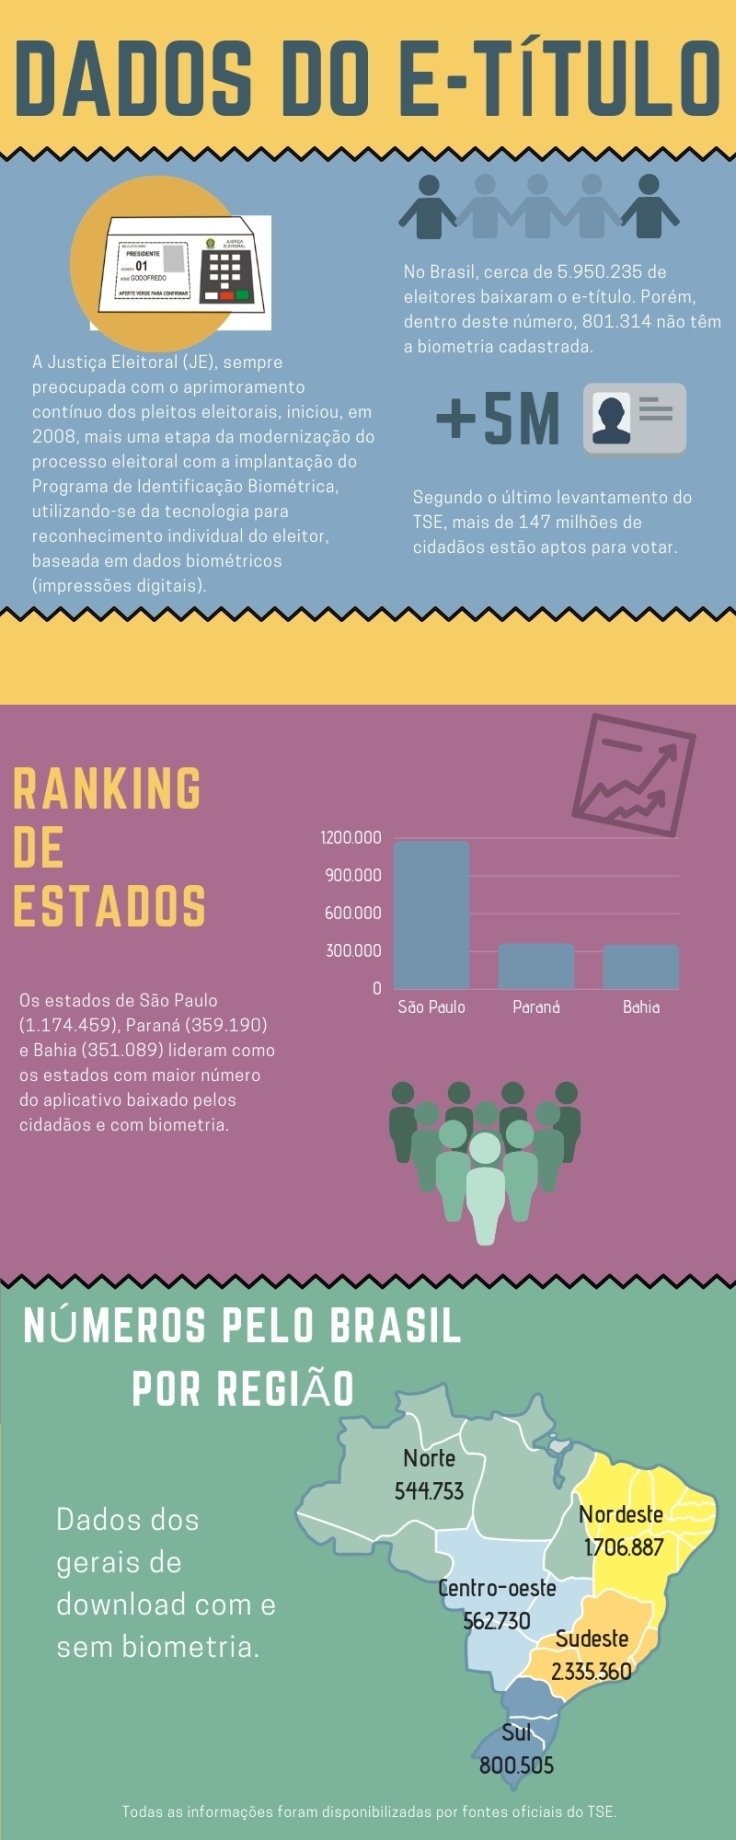 literacy charity infographic-11645074371..jpg